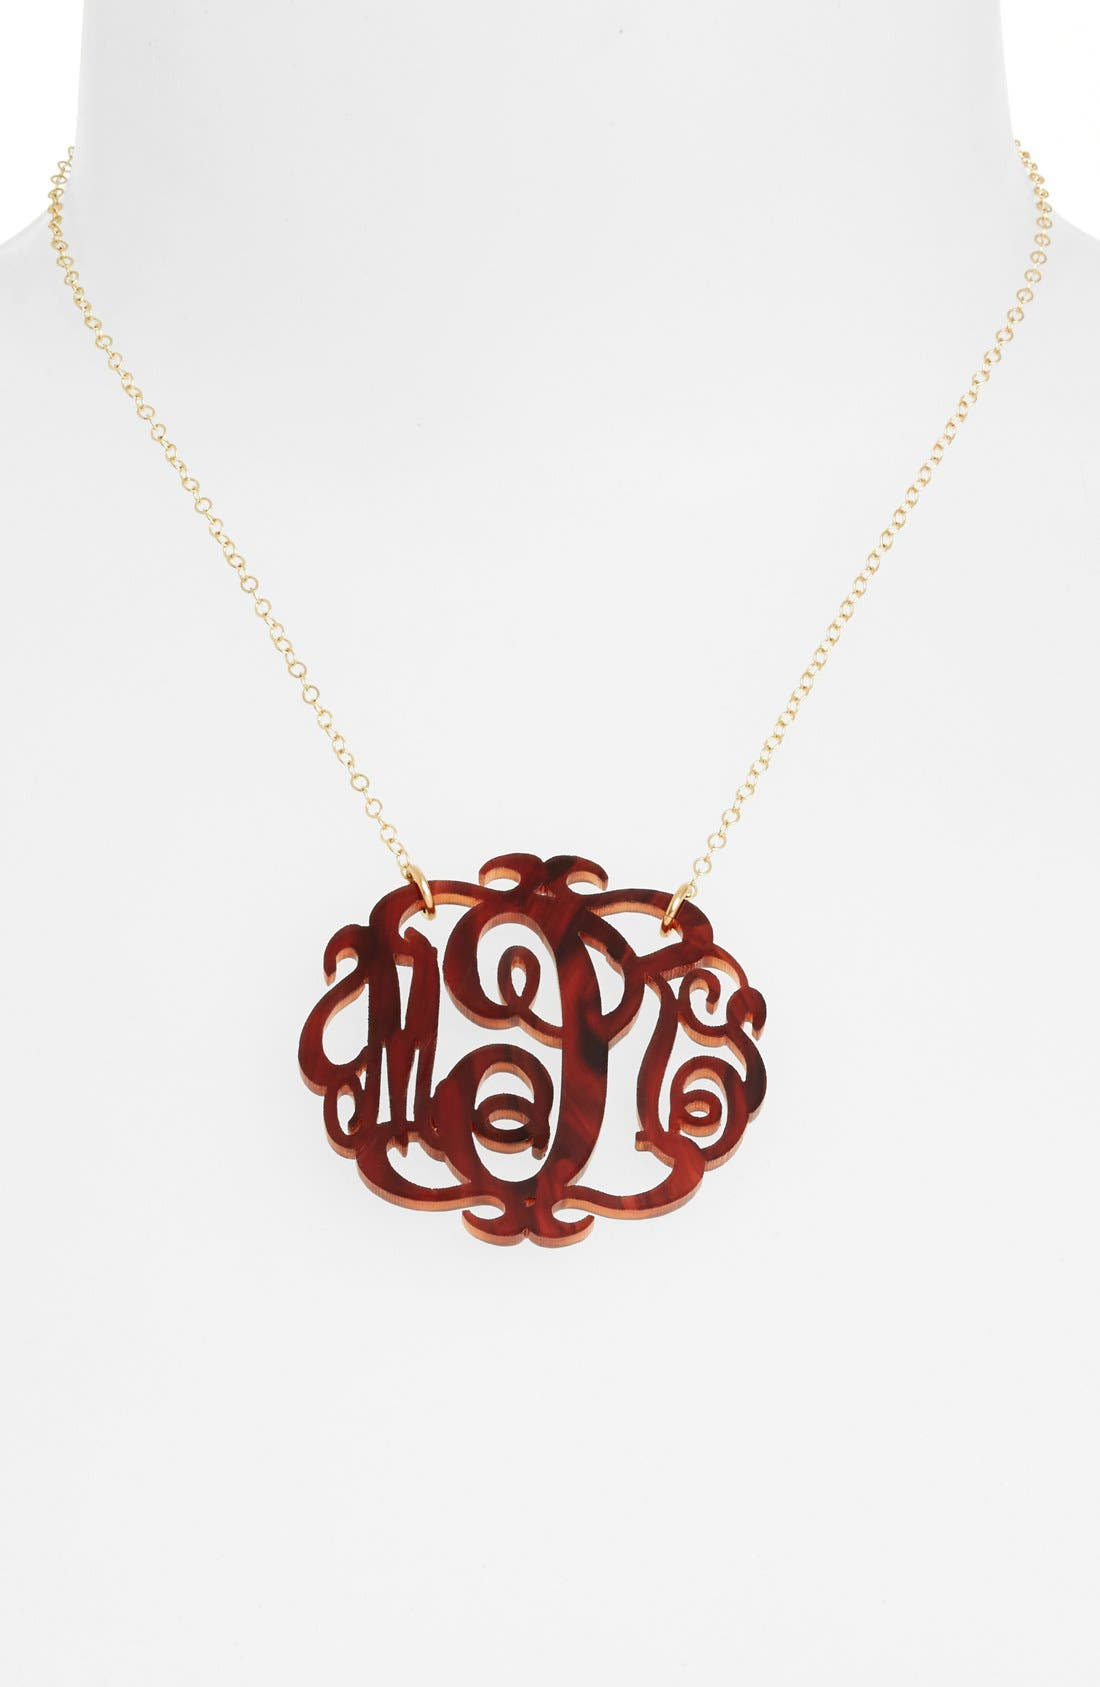 Large Oval Personalized Monogram Pendant Necklace,                         Main,                         color, TORTOISE/ GOLD